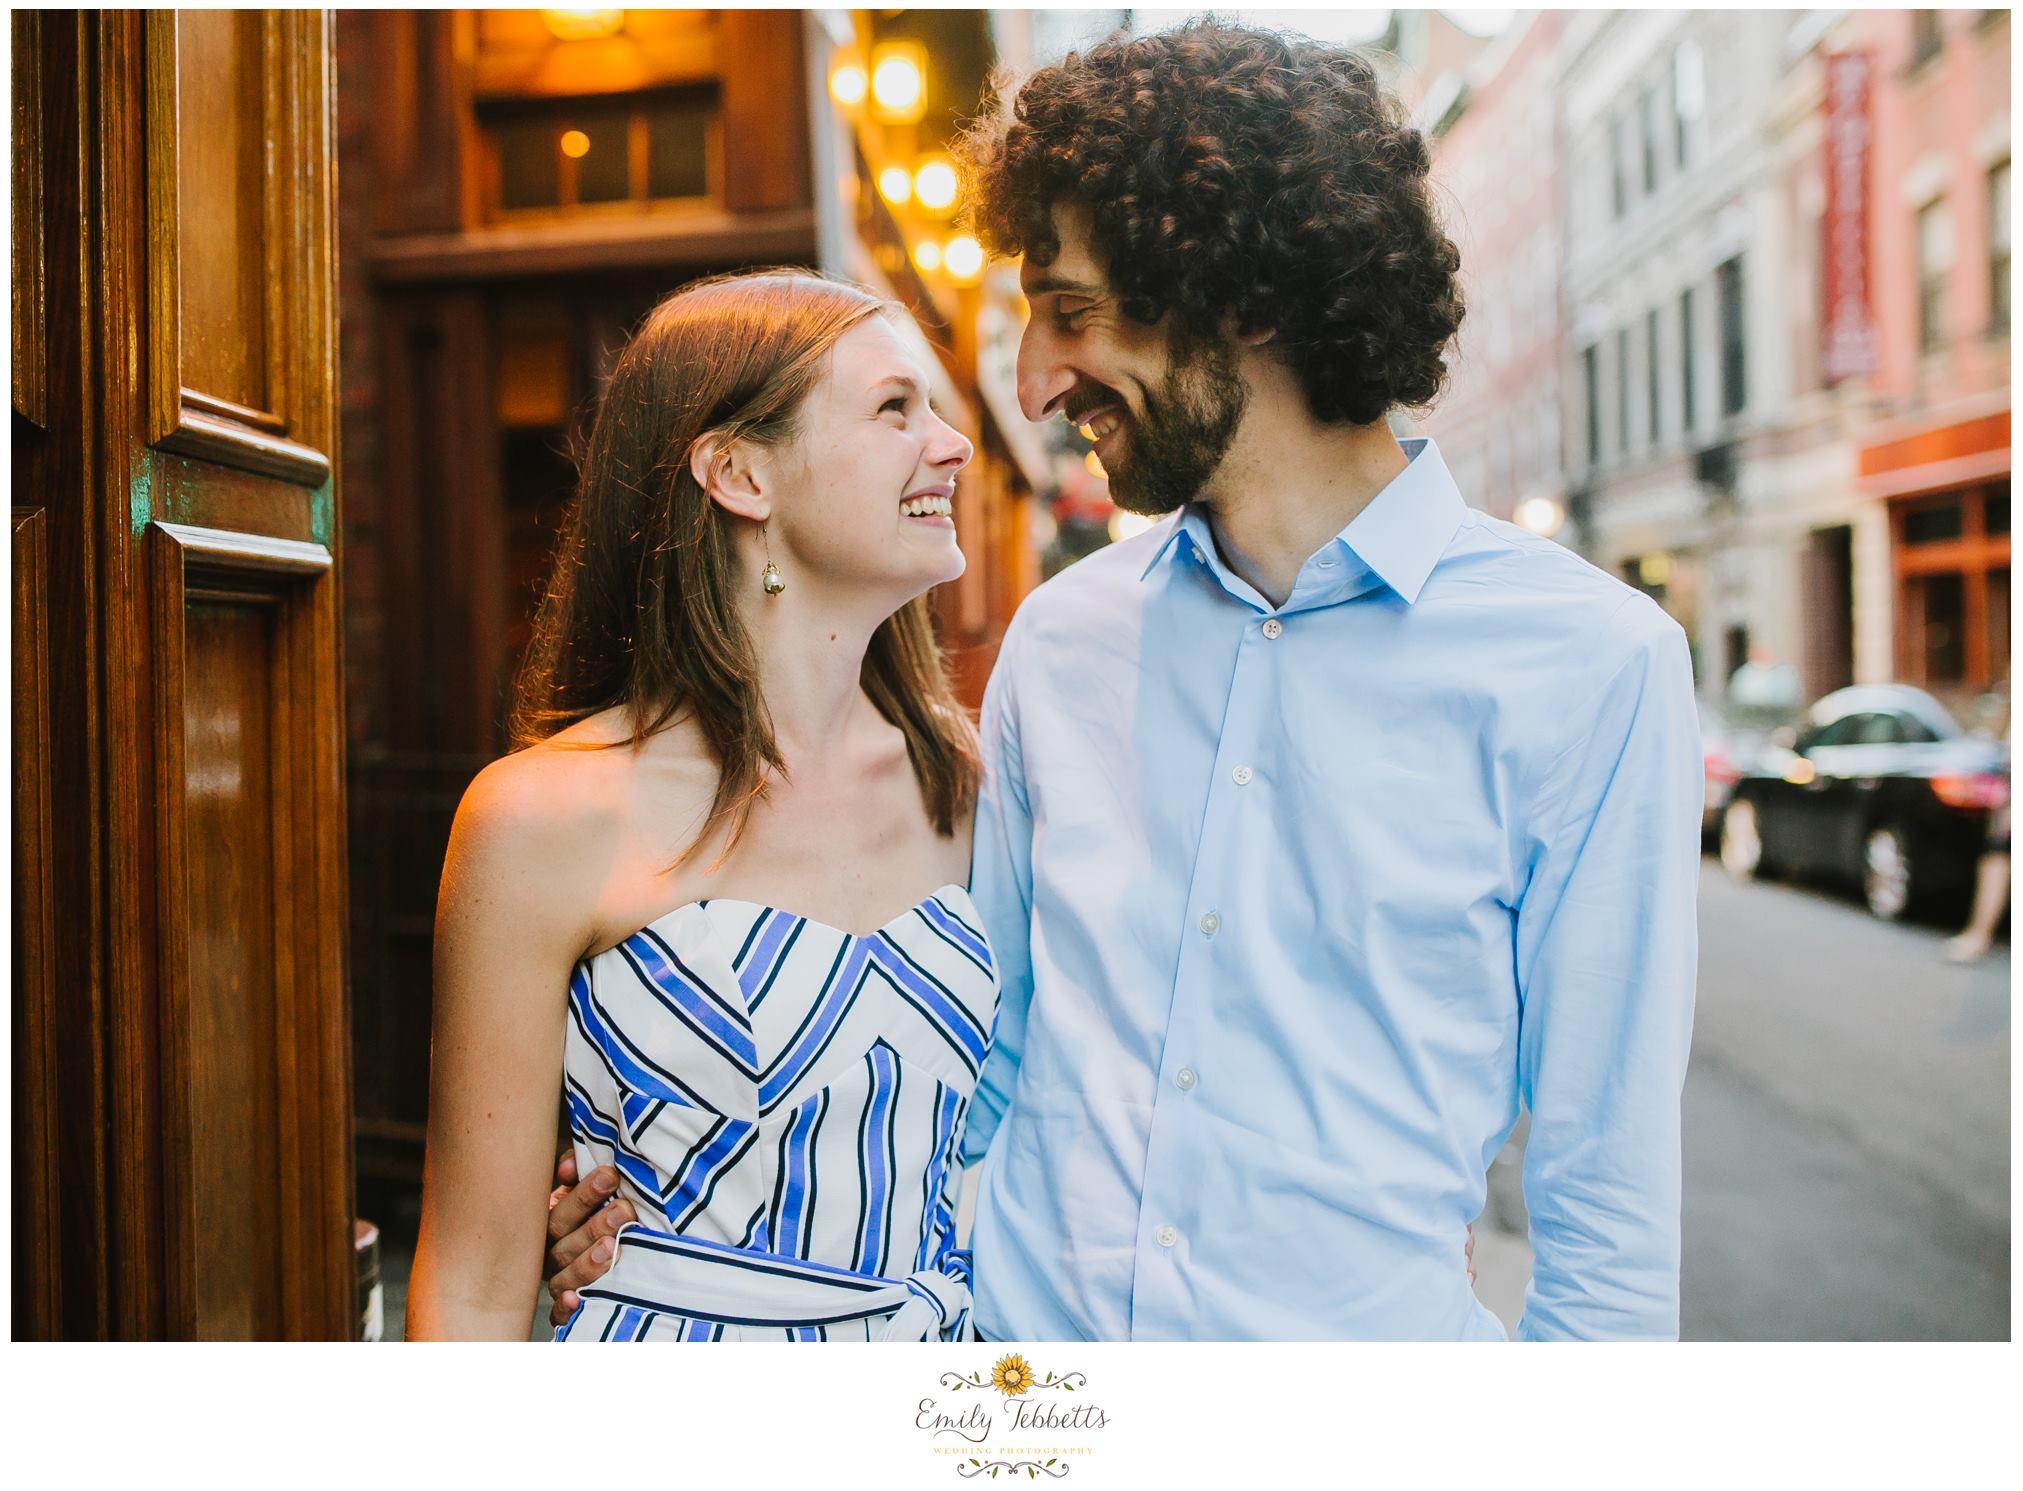 Emily Tebbetts Wedding Photography - North End Engagement Session Sneak Peeks 2.jpg